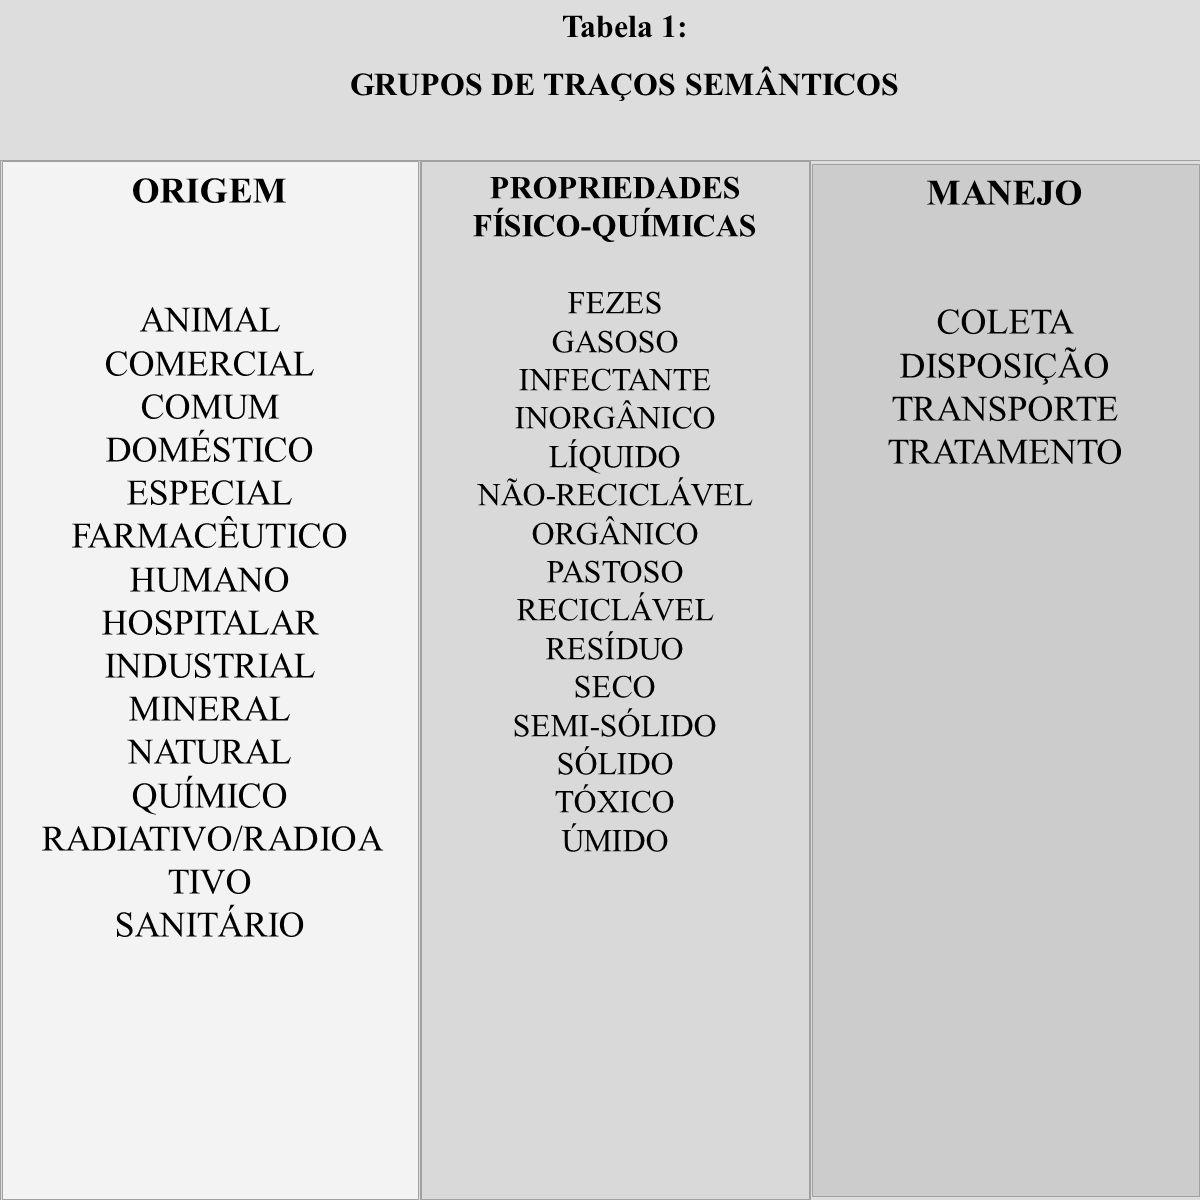 Tabela 1: GRUPOS DE TRAÇOS SEMÂNTICOS ORIGEM ANIMAL COMERCIAL COMUM DOMÉSTICO ESPECIAL FARMACÊUTICO HUMANO HOSPITALAR INDUSTRIAL MINERAL NATURAL QUÍMI